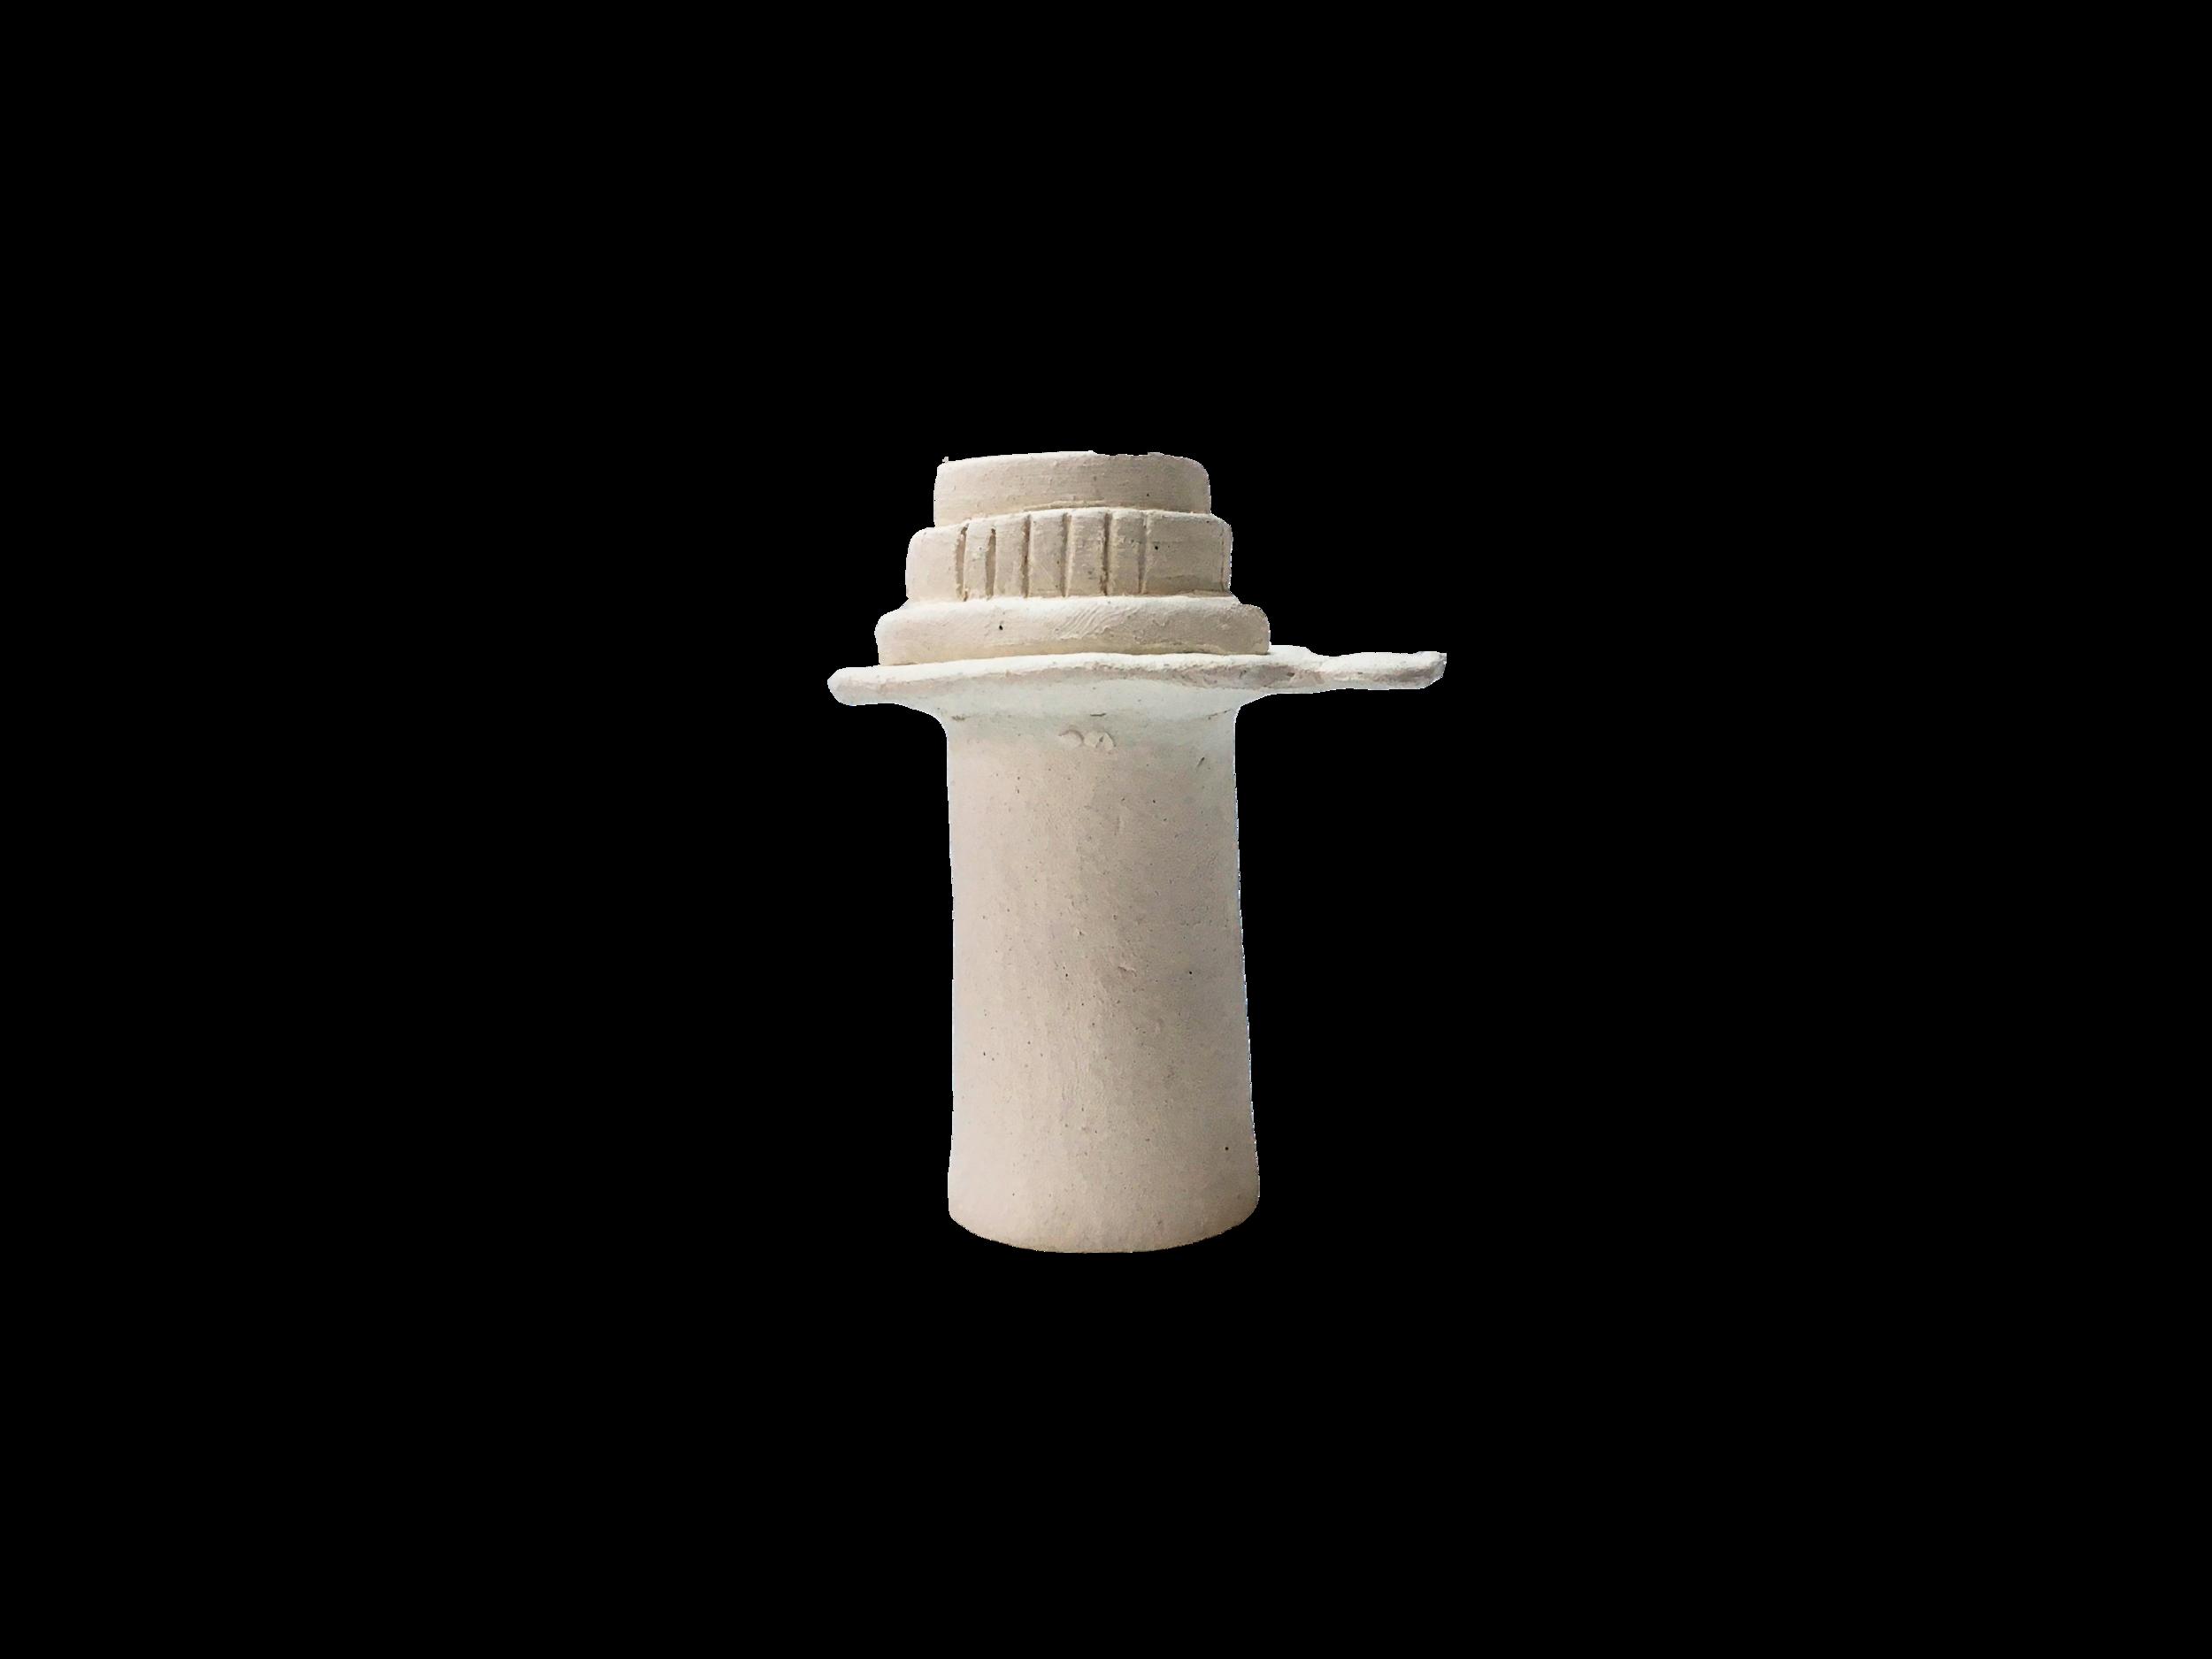 pill bottle_Sonoma_4_27_18.png